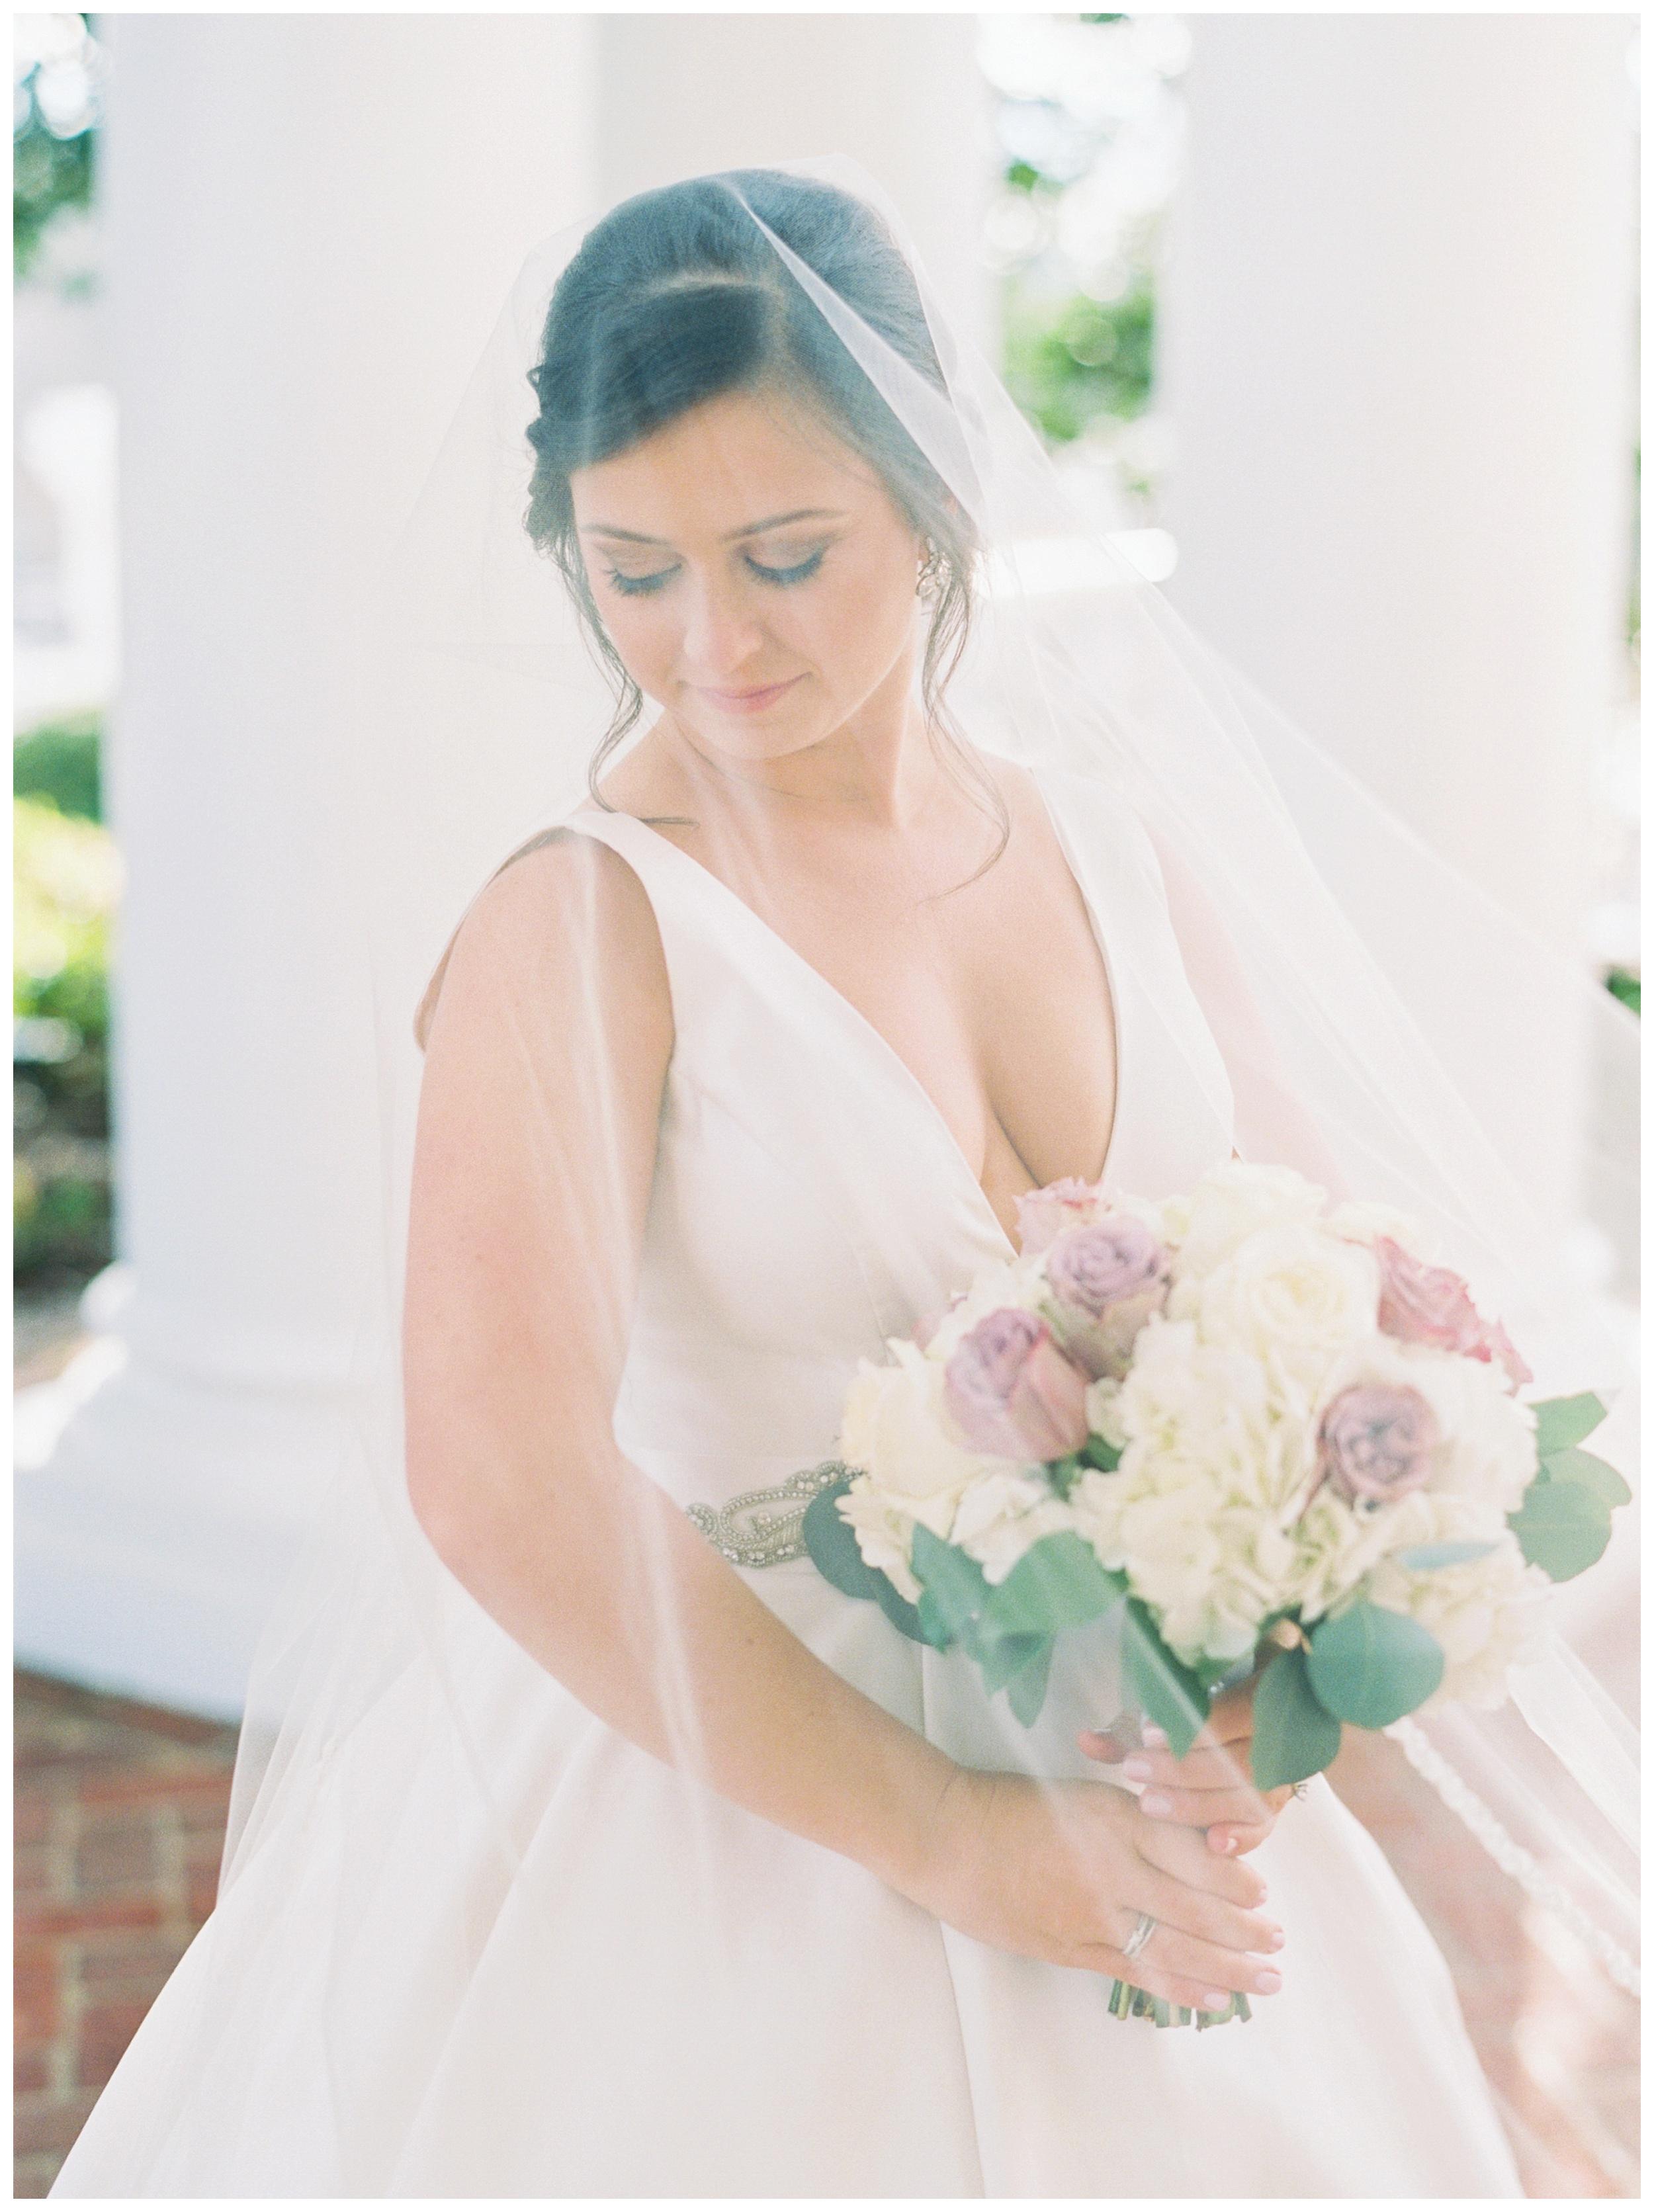 Country Club of Virginia Wedding | Richmond Wedding Photographer_0099.jpg